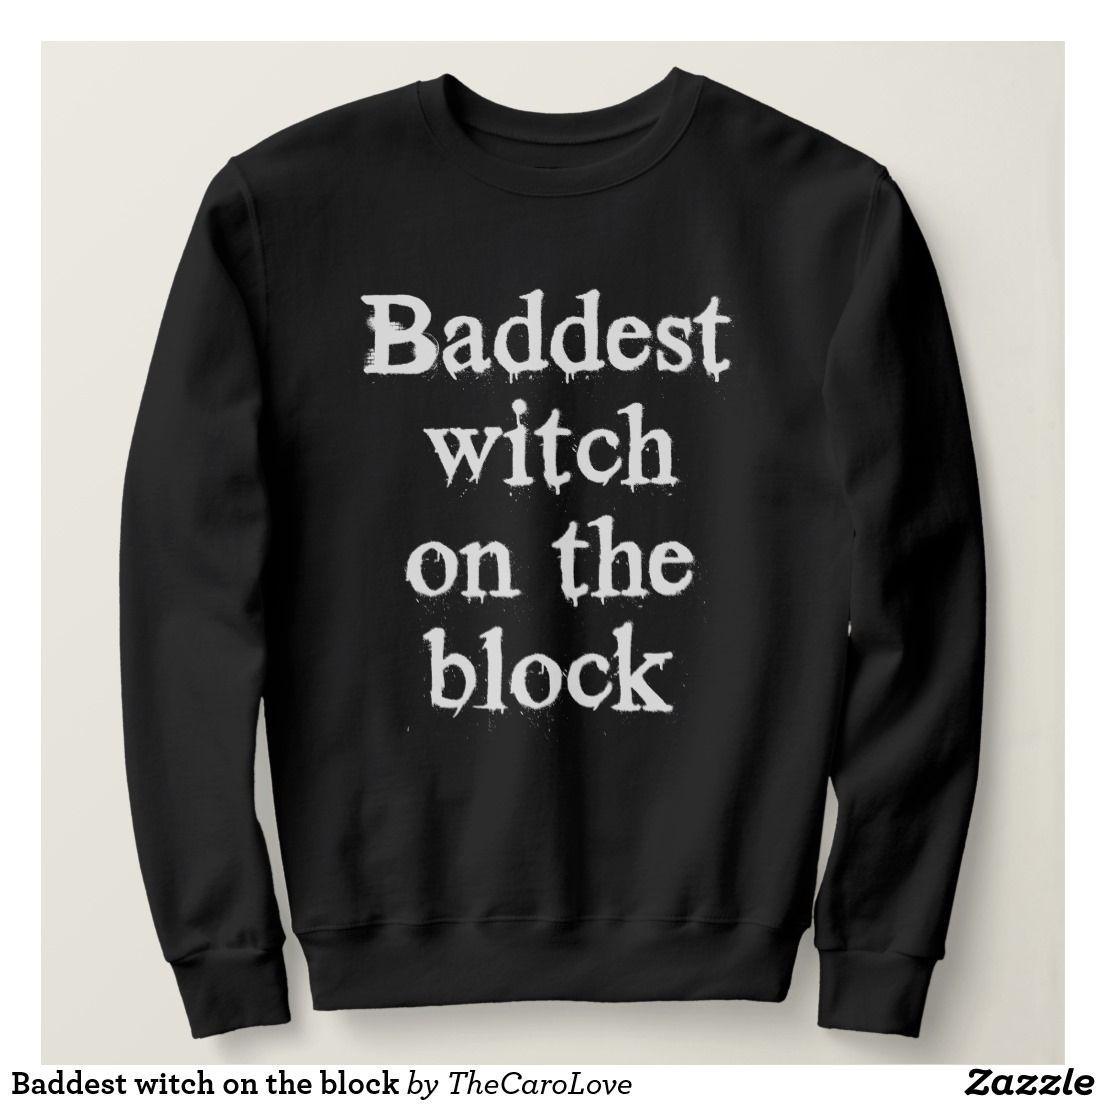 2fca0ce16788 Baddest witch on the block sweatshirt   Zazzle.com   Halloween/ Fall ...